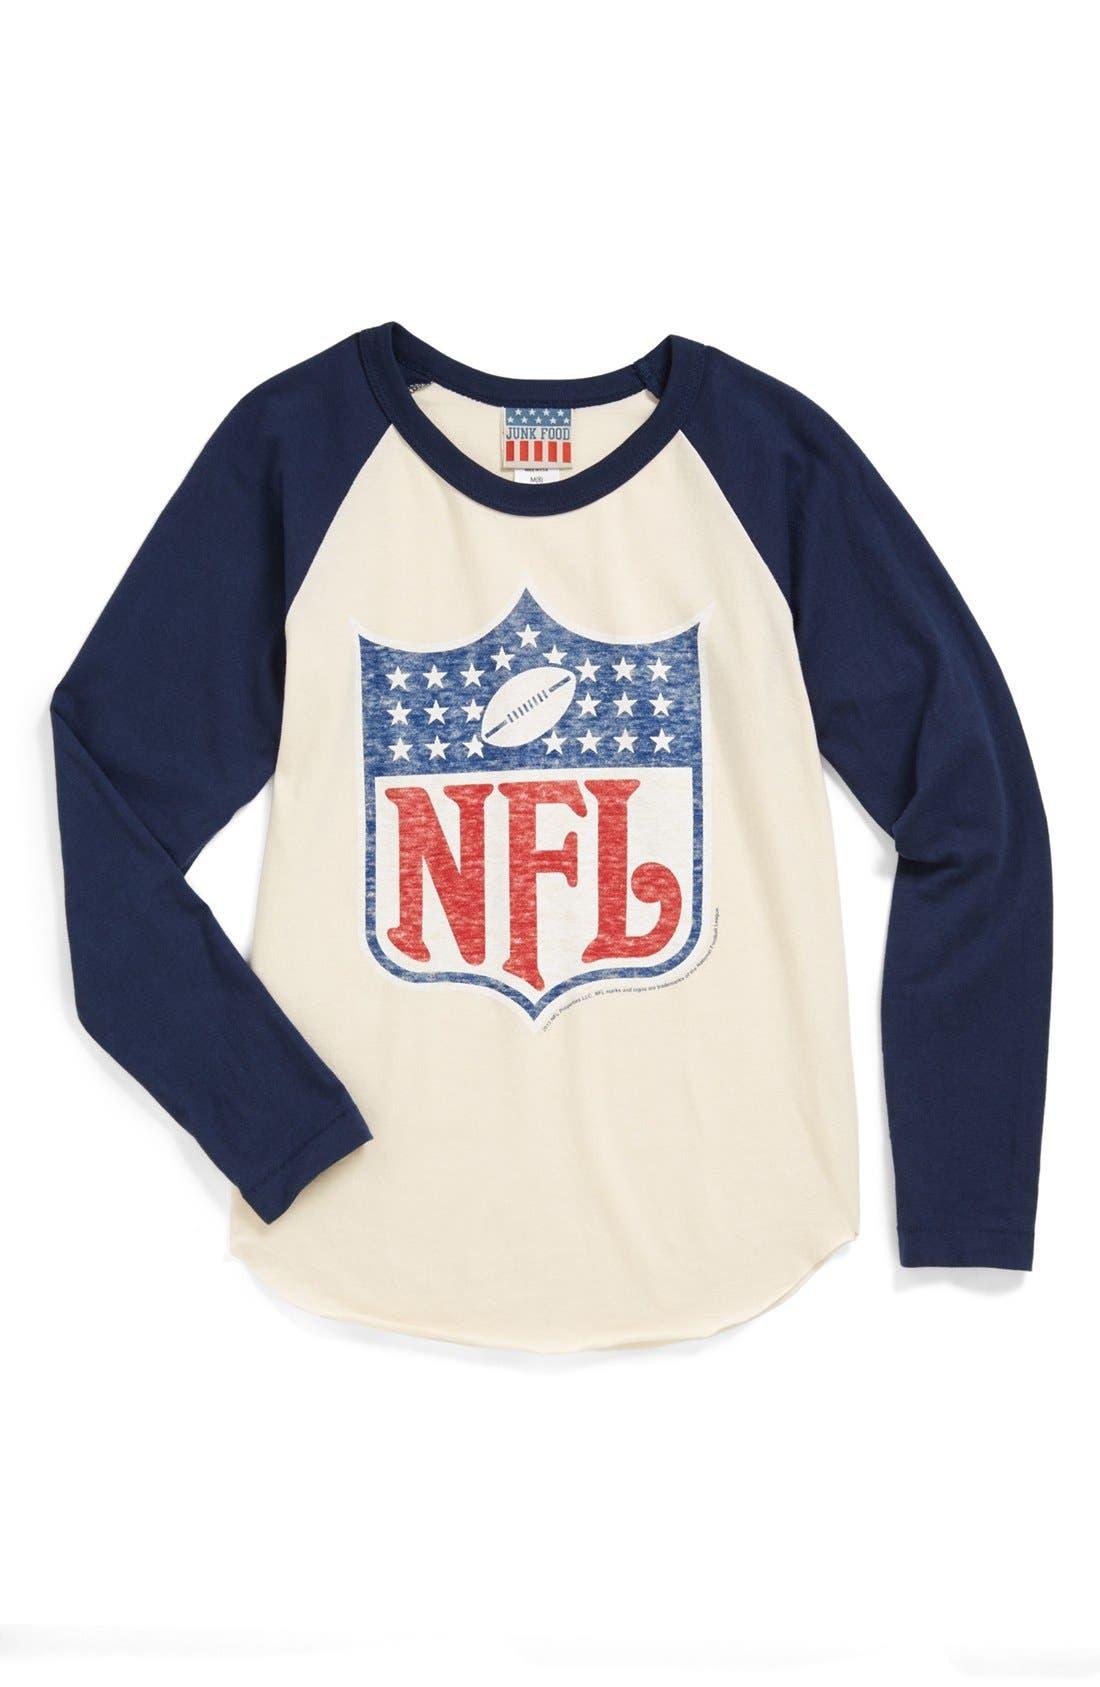 Alternate Image 1 Selected - Junk Food 'NFL Shield' Raglan Long Sleeve T-Shirt (Little Boys & Big Boys)